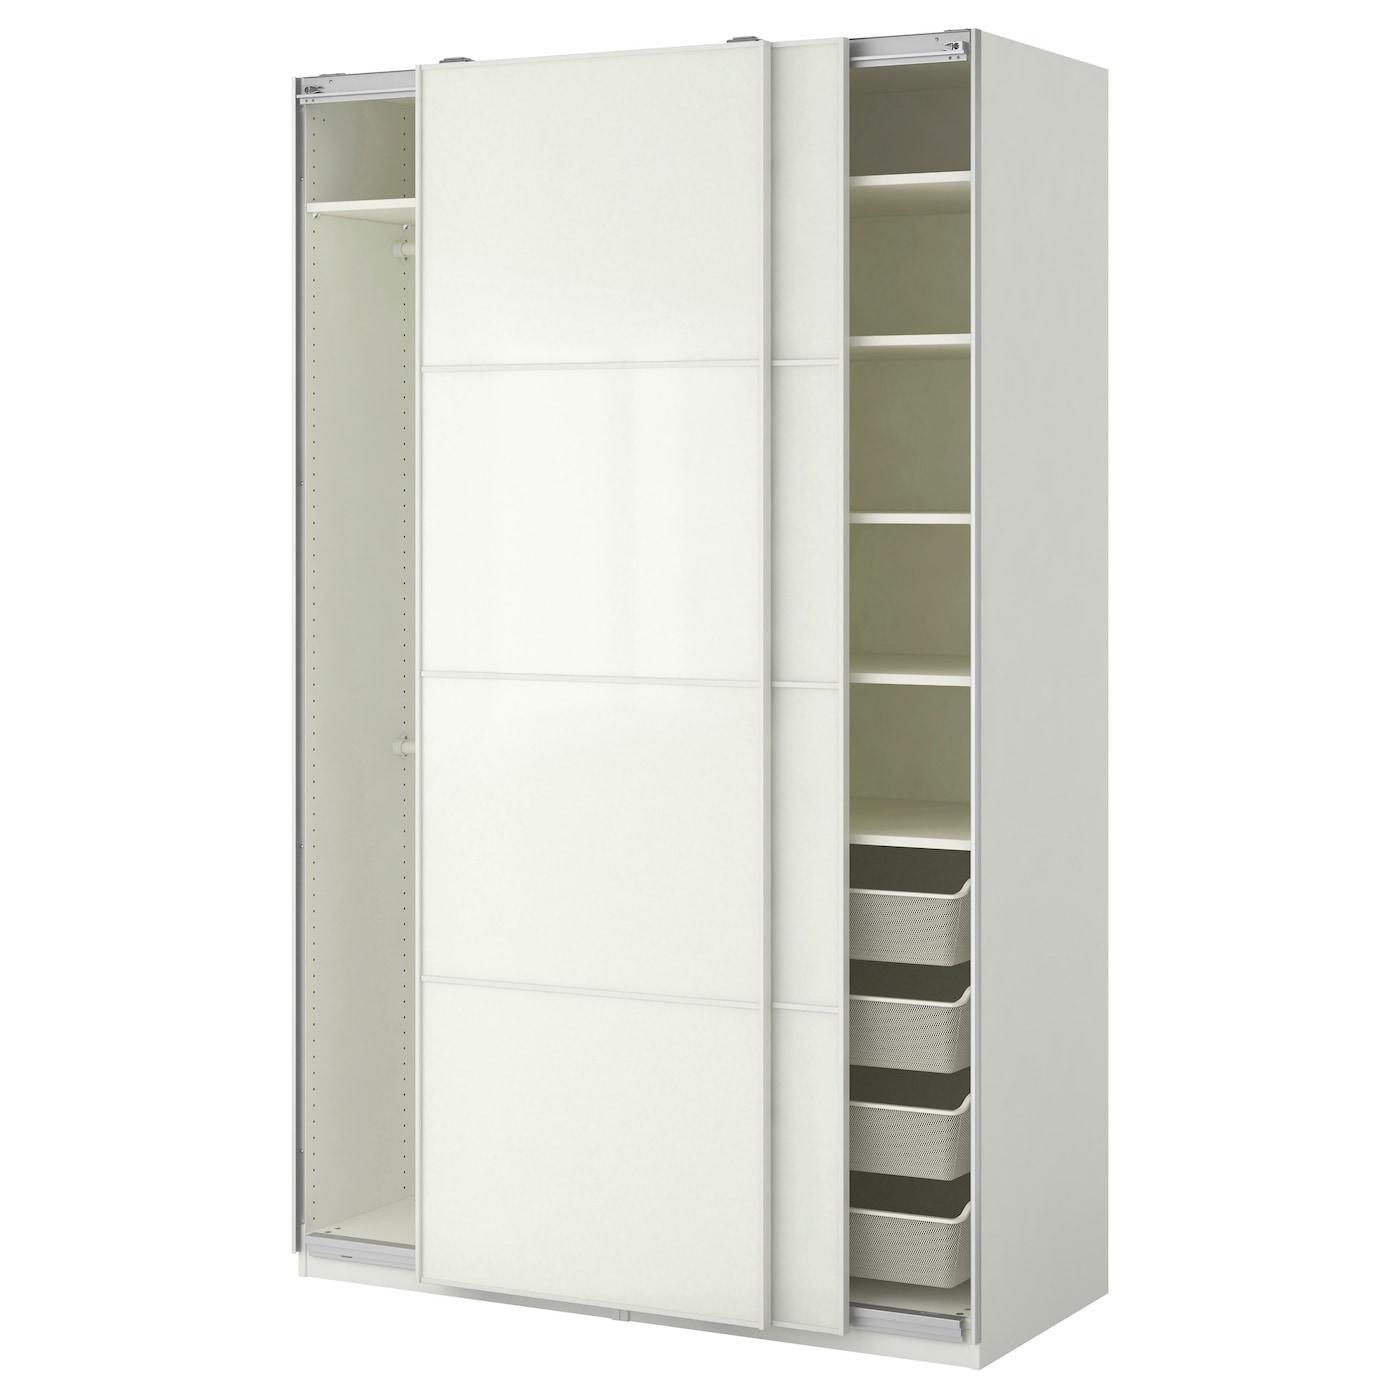 Ikea Schuifwand Latest Ikea Pax Wardrobe Whiteauli Mirror